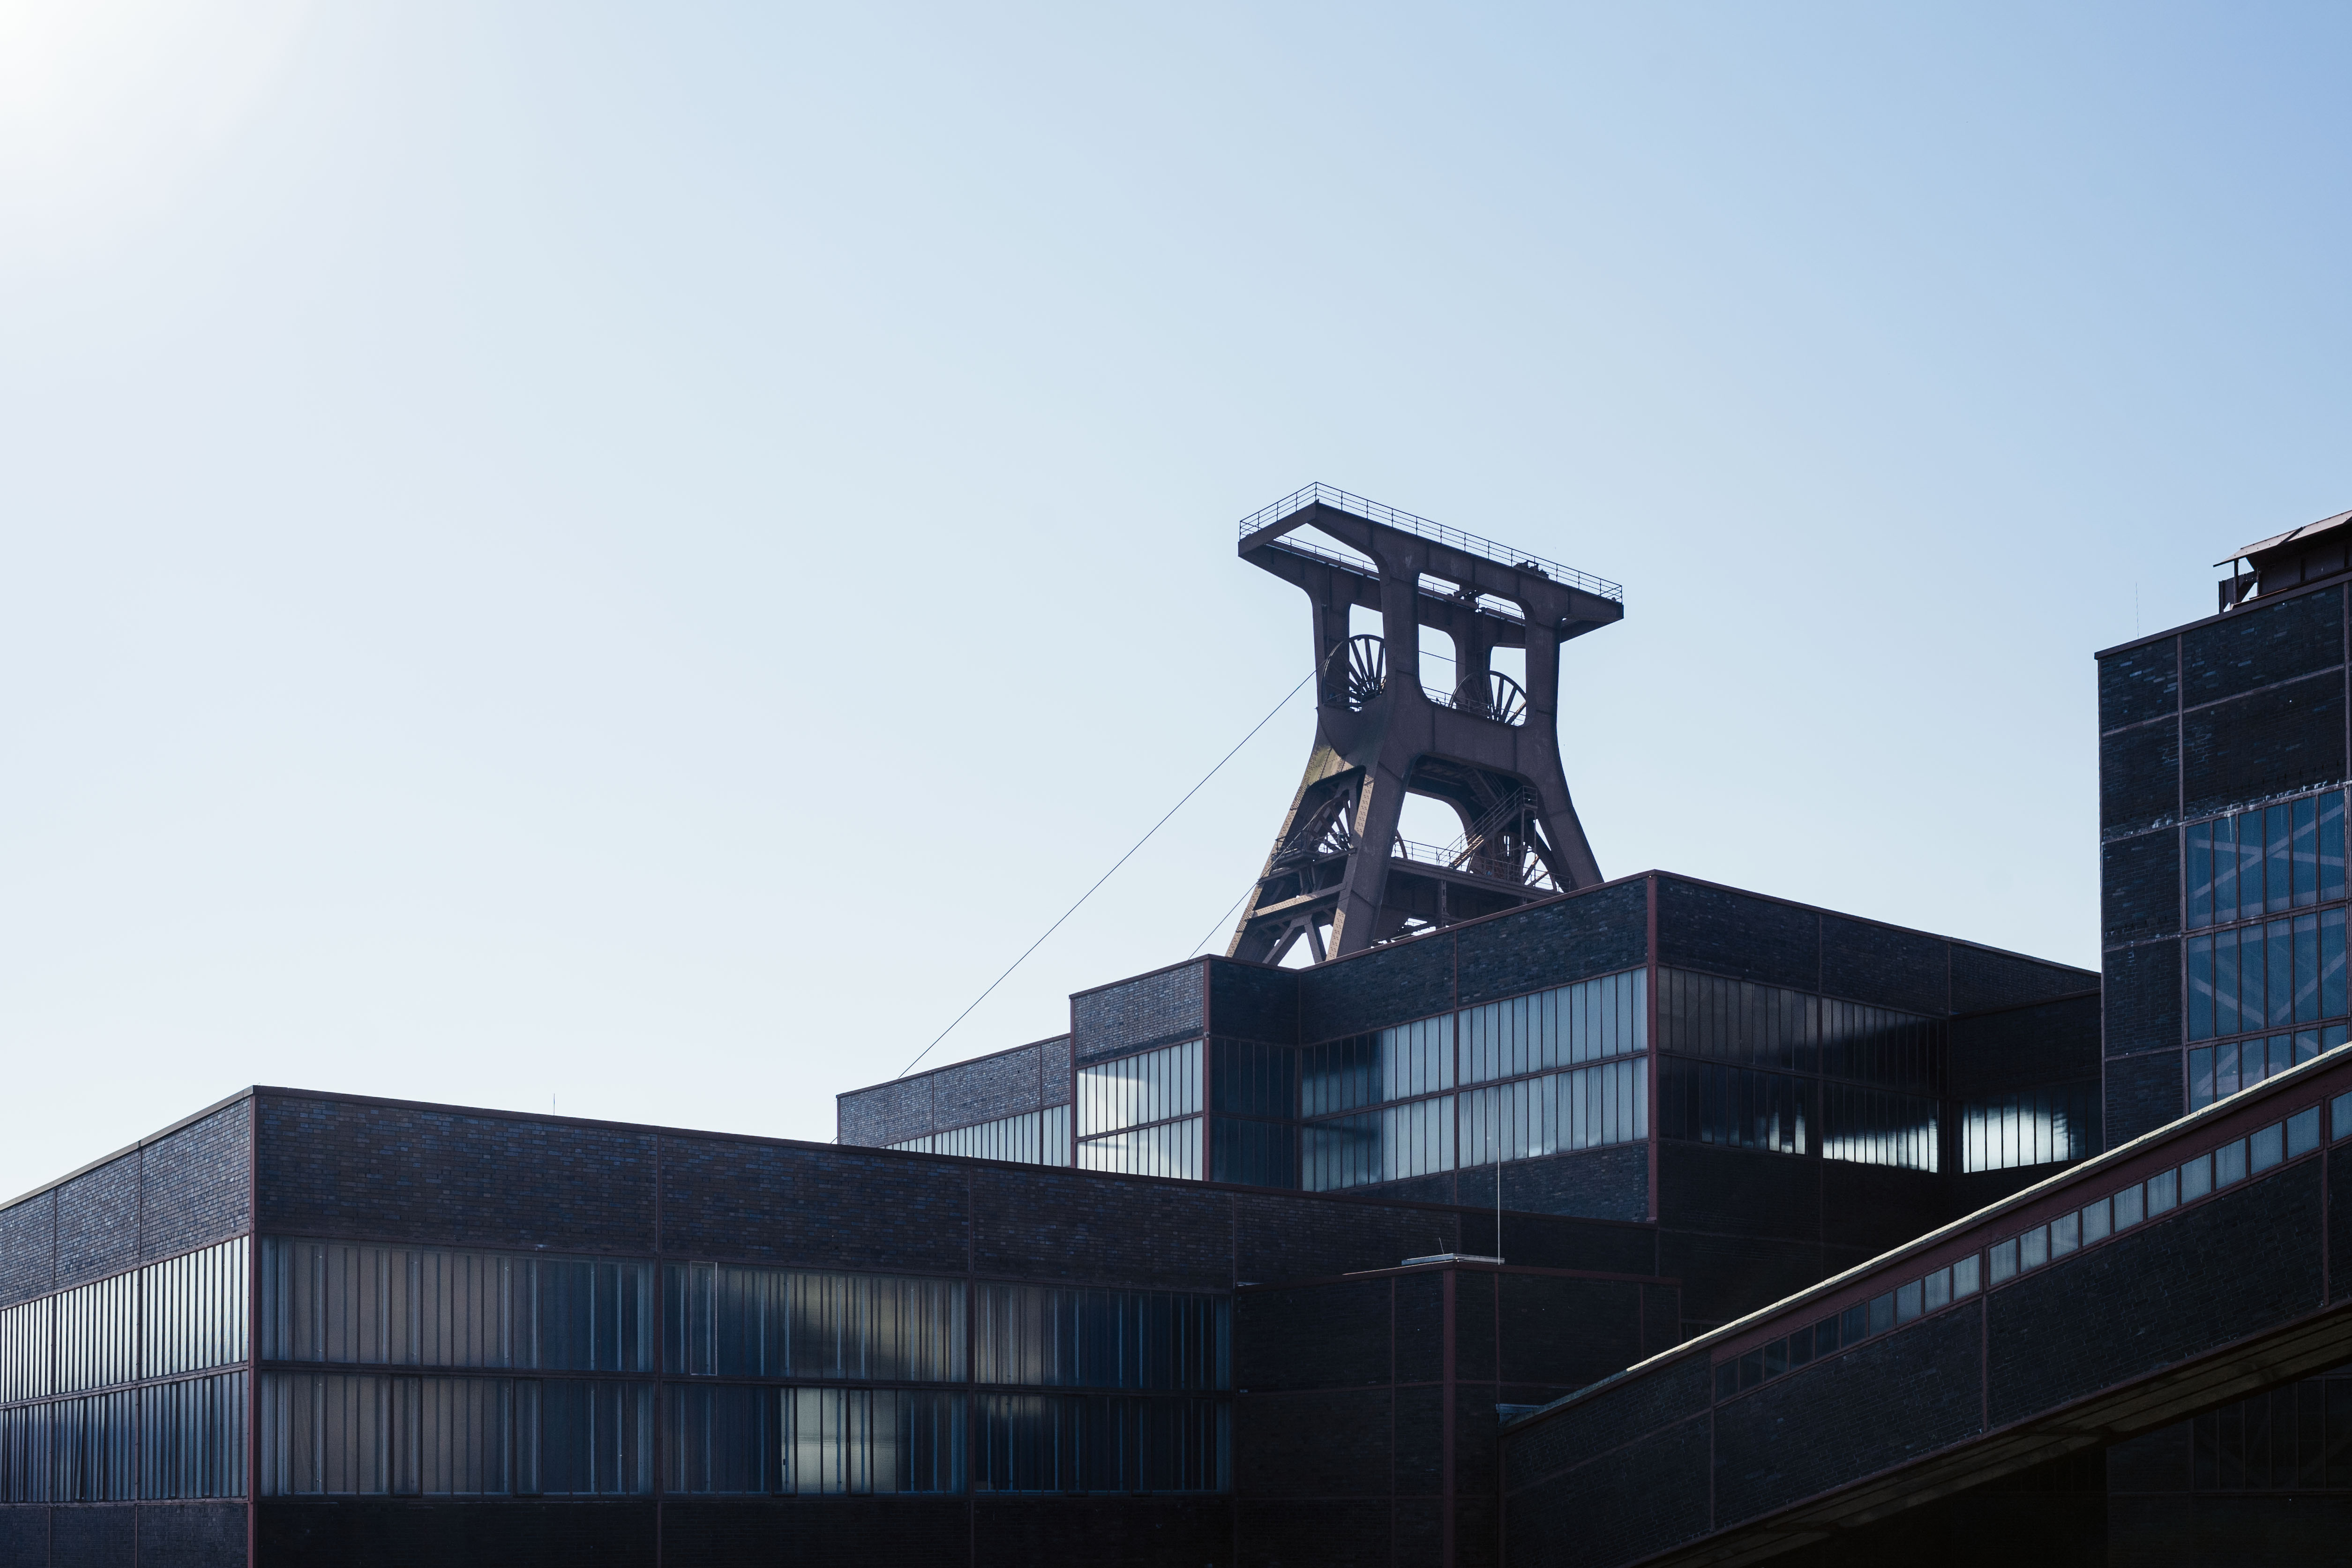 Zeche Zollverein Fördergerüst Schacht XII / Zollverein Coal Mine Industrial Complex Pocket XII (1928–1932), Architekten / architects: Fritz Schupp, Martin Kremmer Photo: © Tillmann Franzen, tillmannfranzen.com